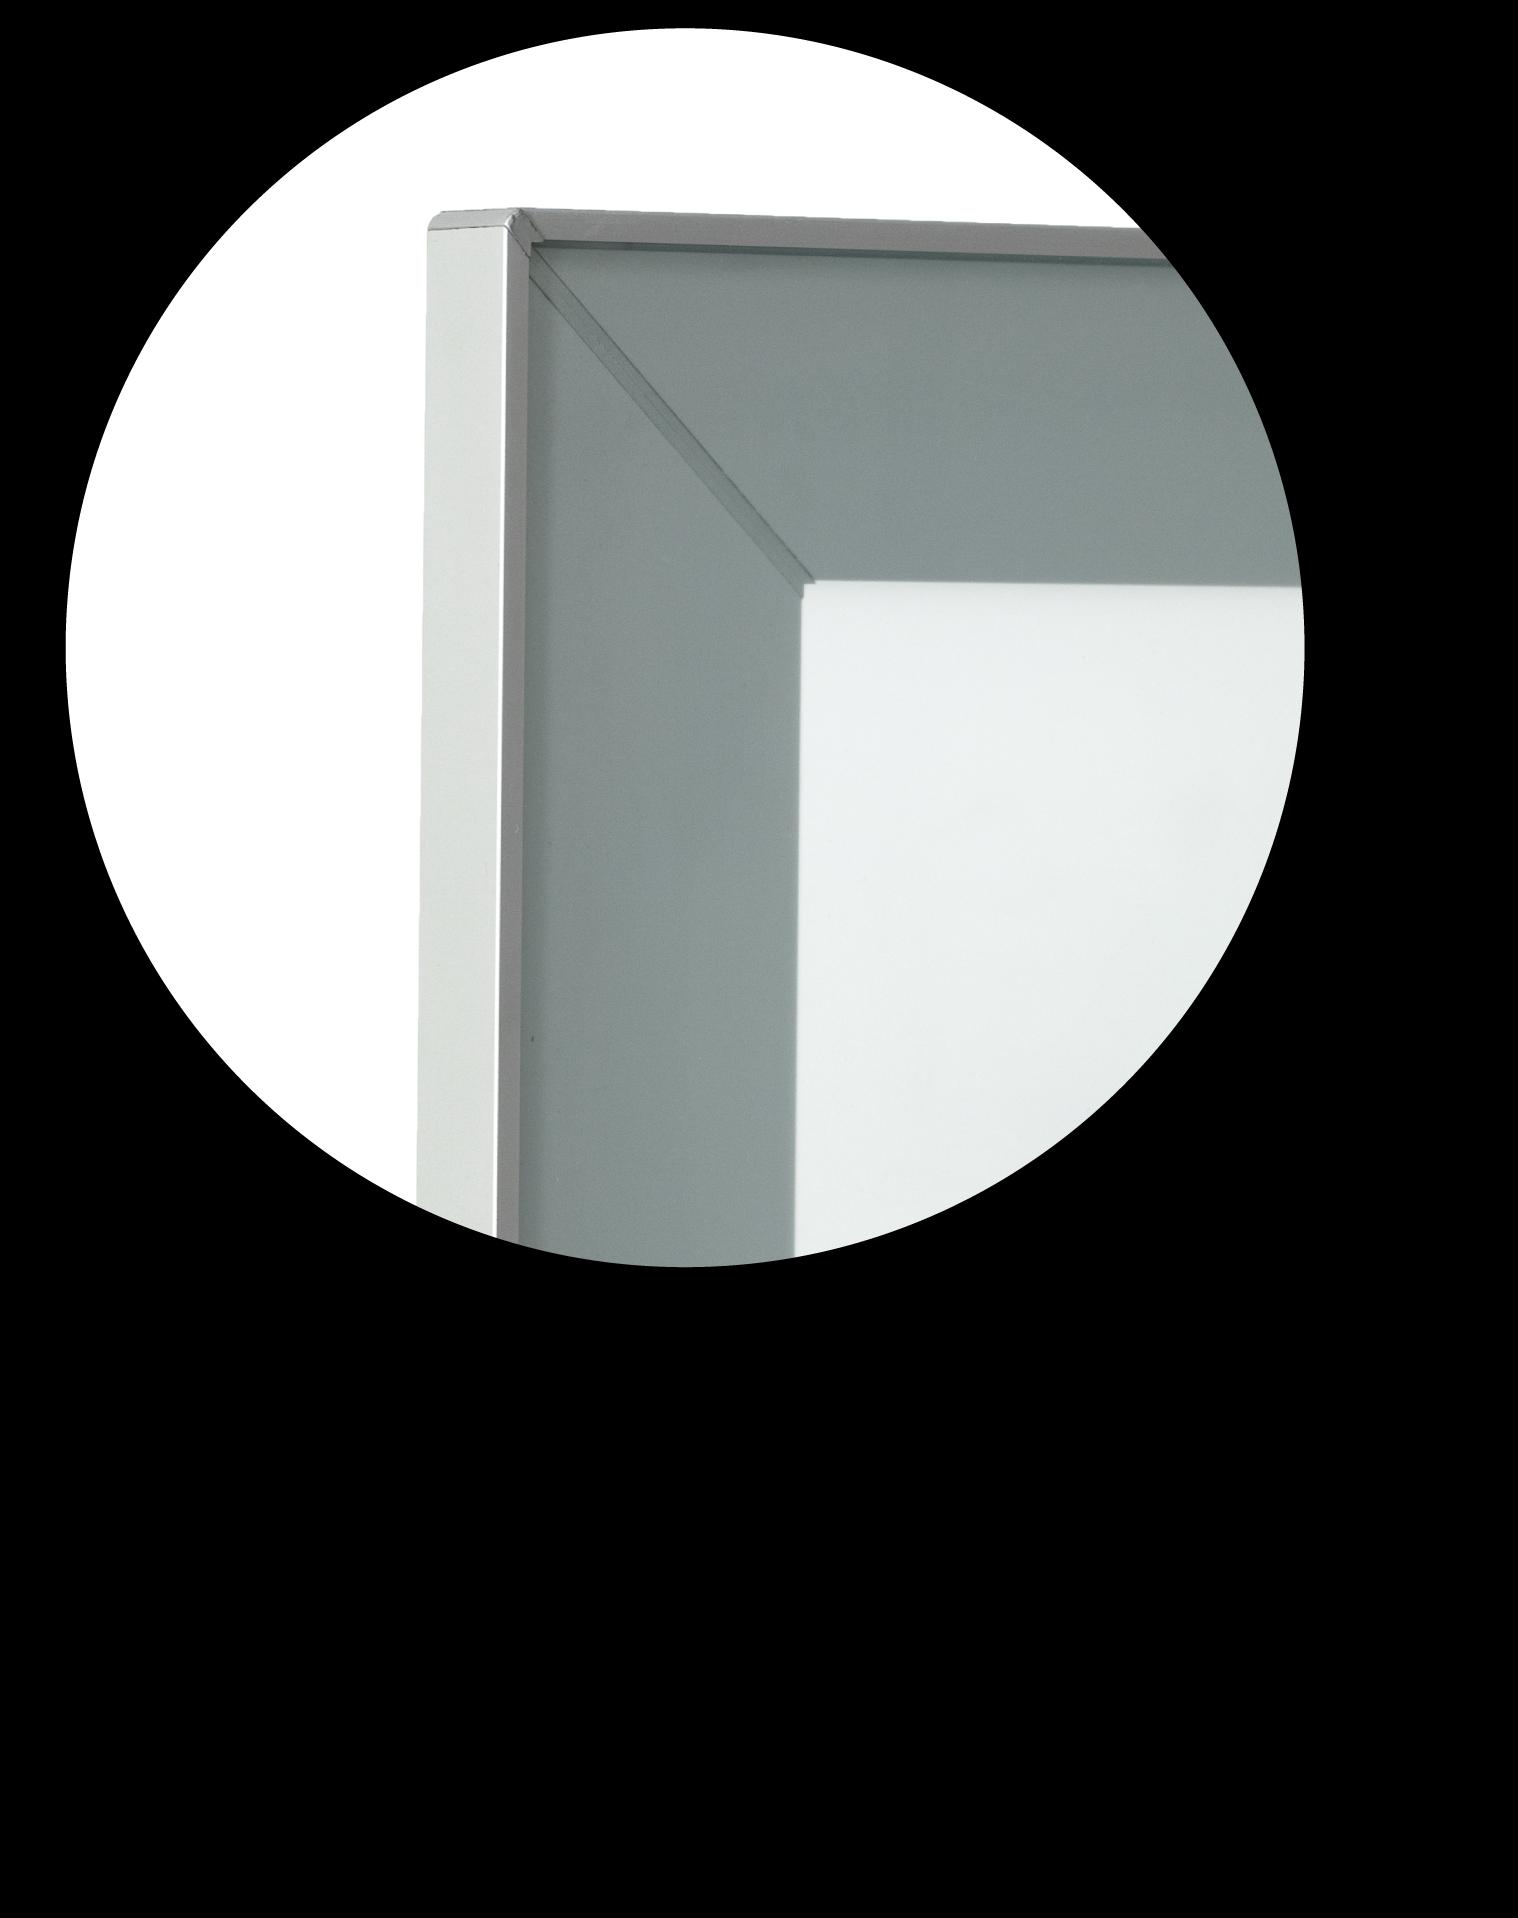 Anta alluminio vetro acidato